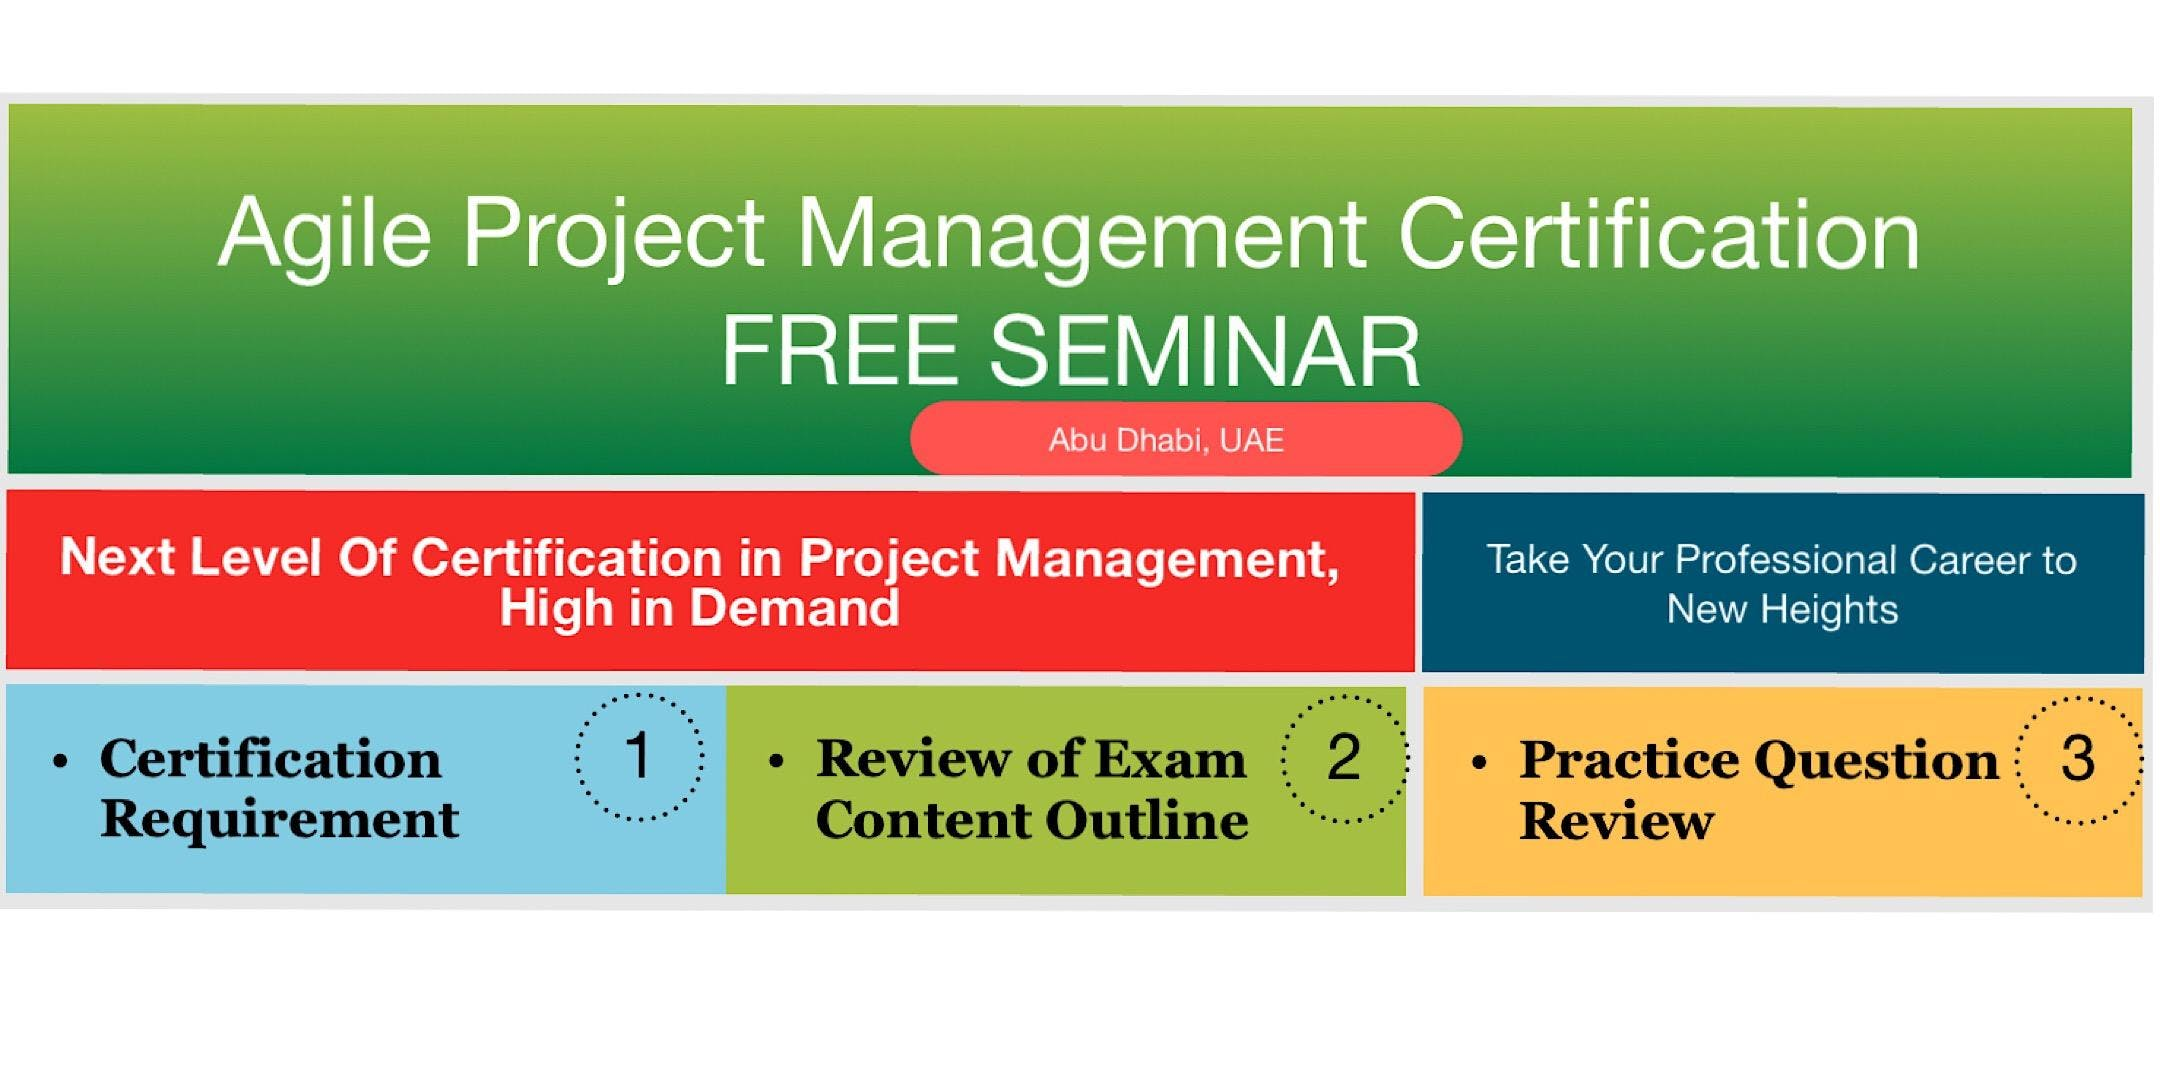 Agile Project Management Certification Seminar 29 Jun 2018